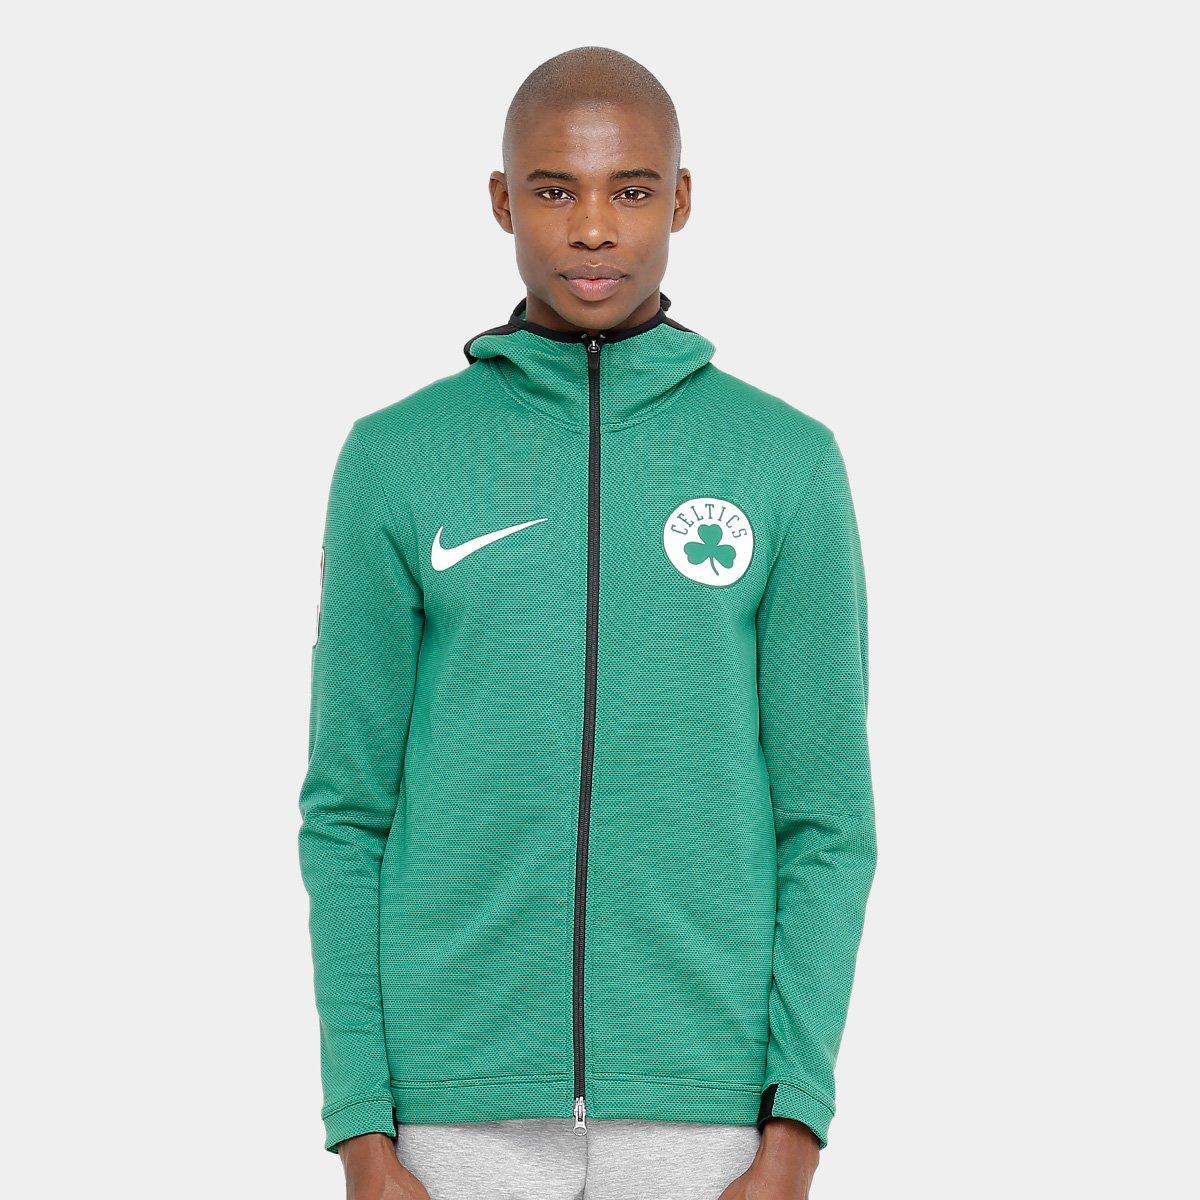 889eec2e6ccb6 Jaqueta NBA Boston Celtics Nike Aquecimento Masculina - Compre Agora ...